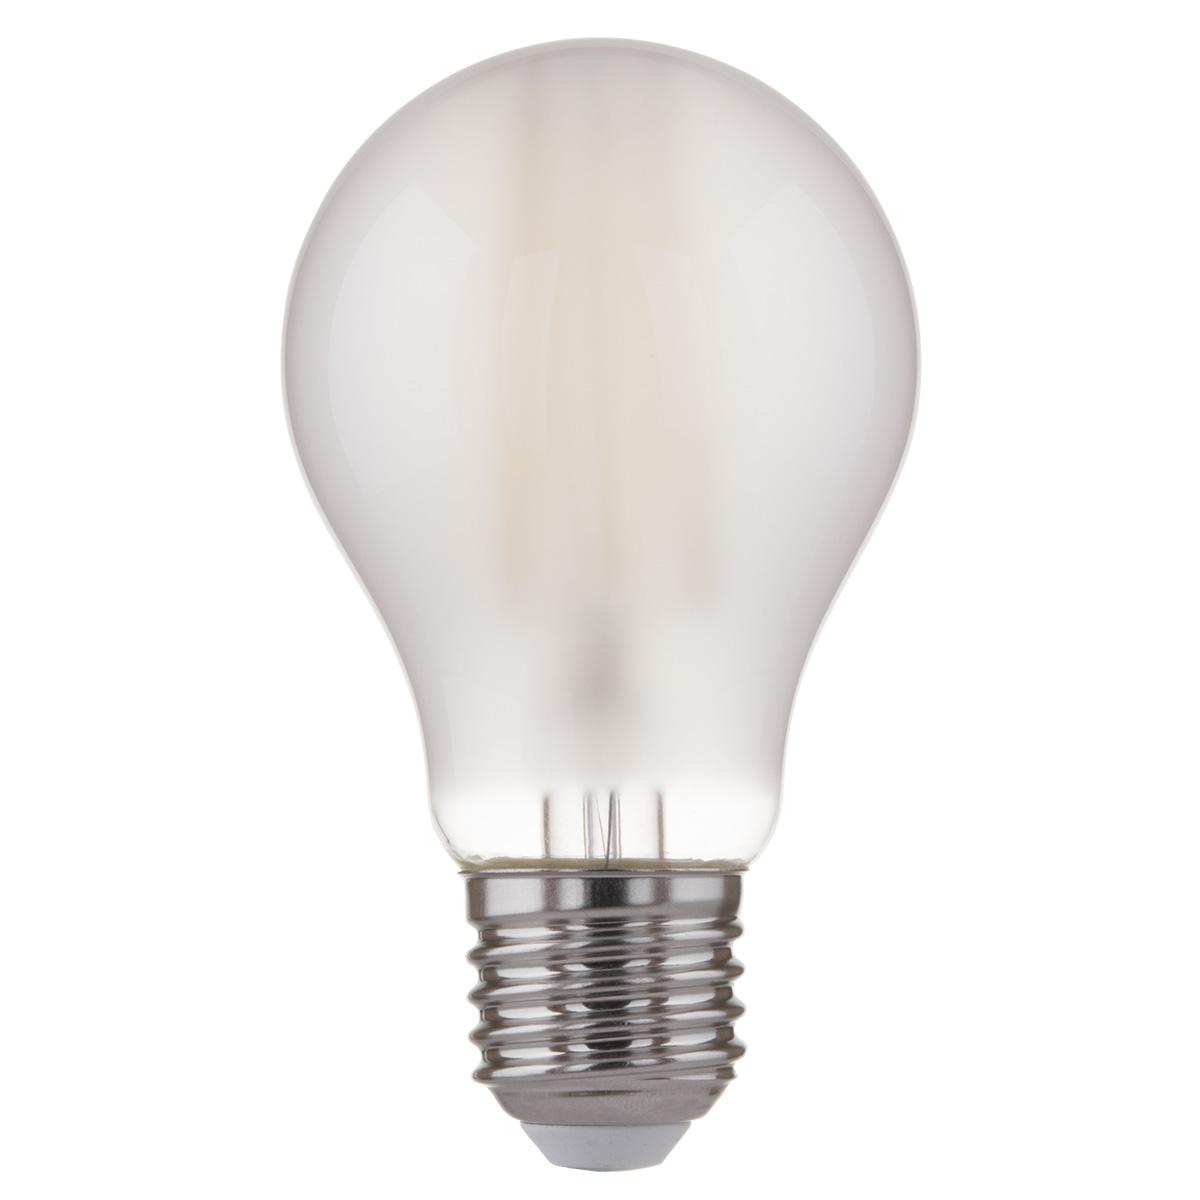 Лампа LED - Classic F 8W 4200K E27 (A60 белый матовый)